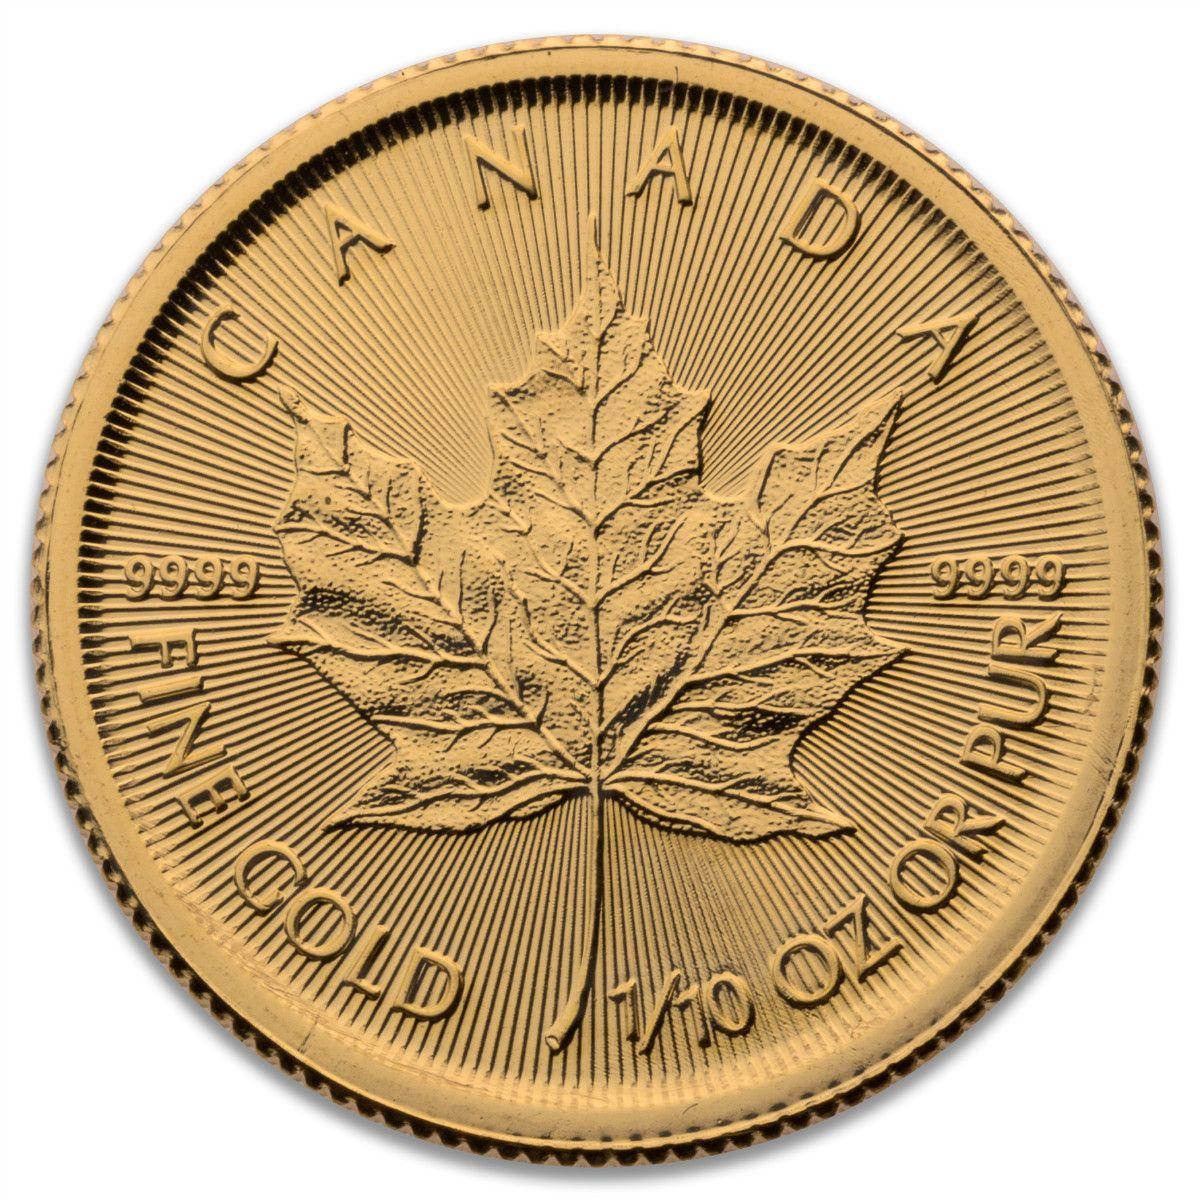 2020 Canadian Gold Maple Leaf 1 10 Oz 9999 Canadian Pmx Gold Bullion Maple Leaf Gold